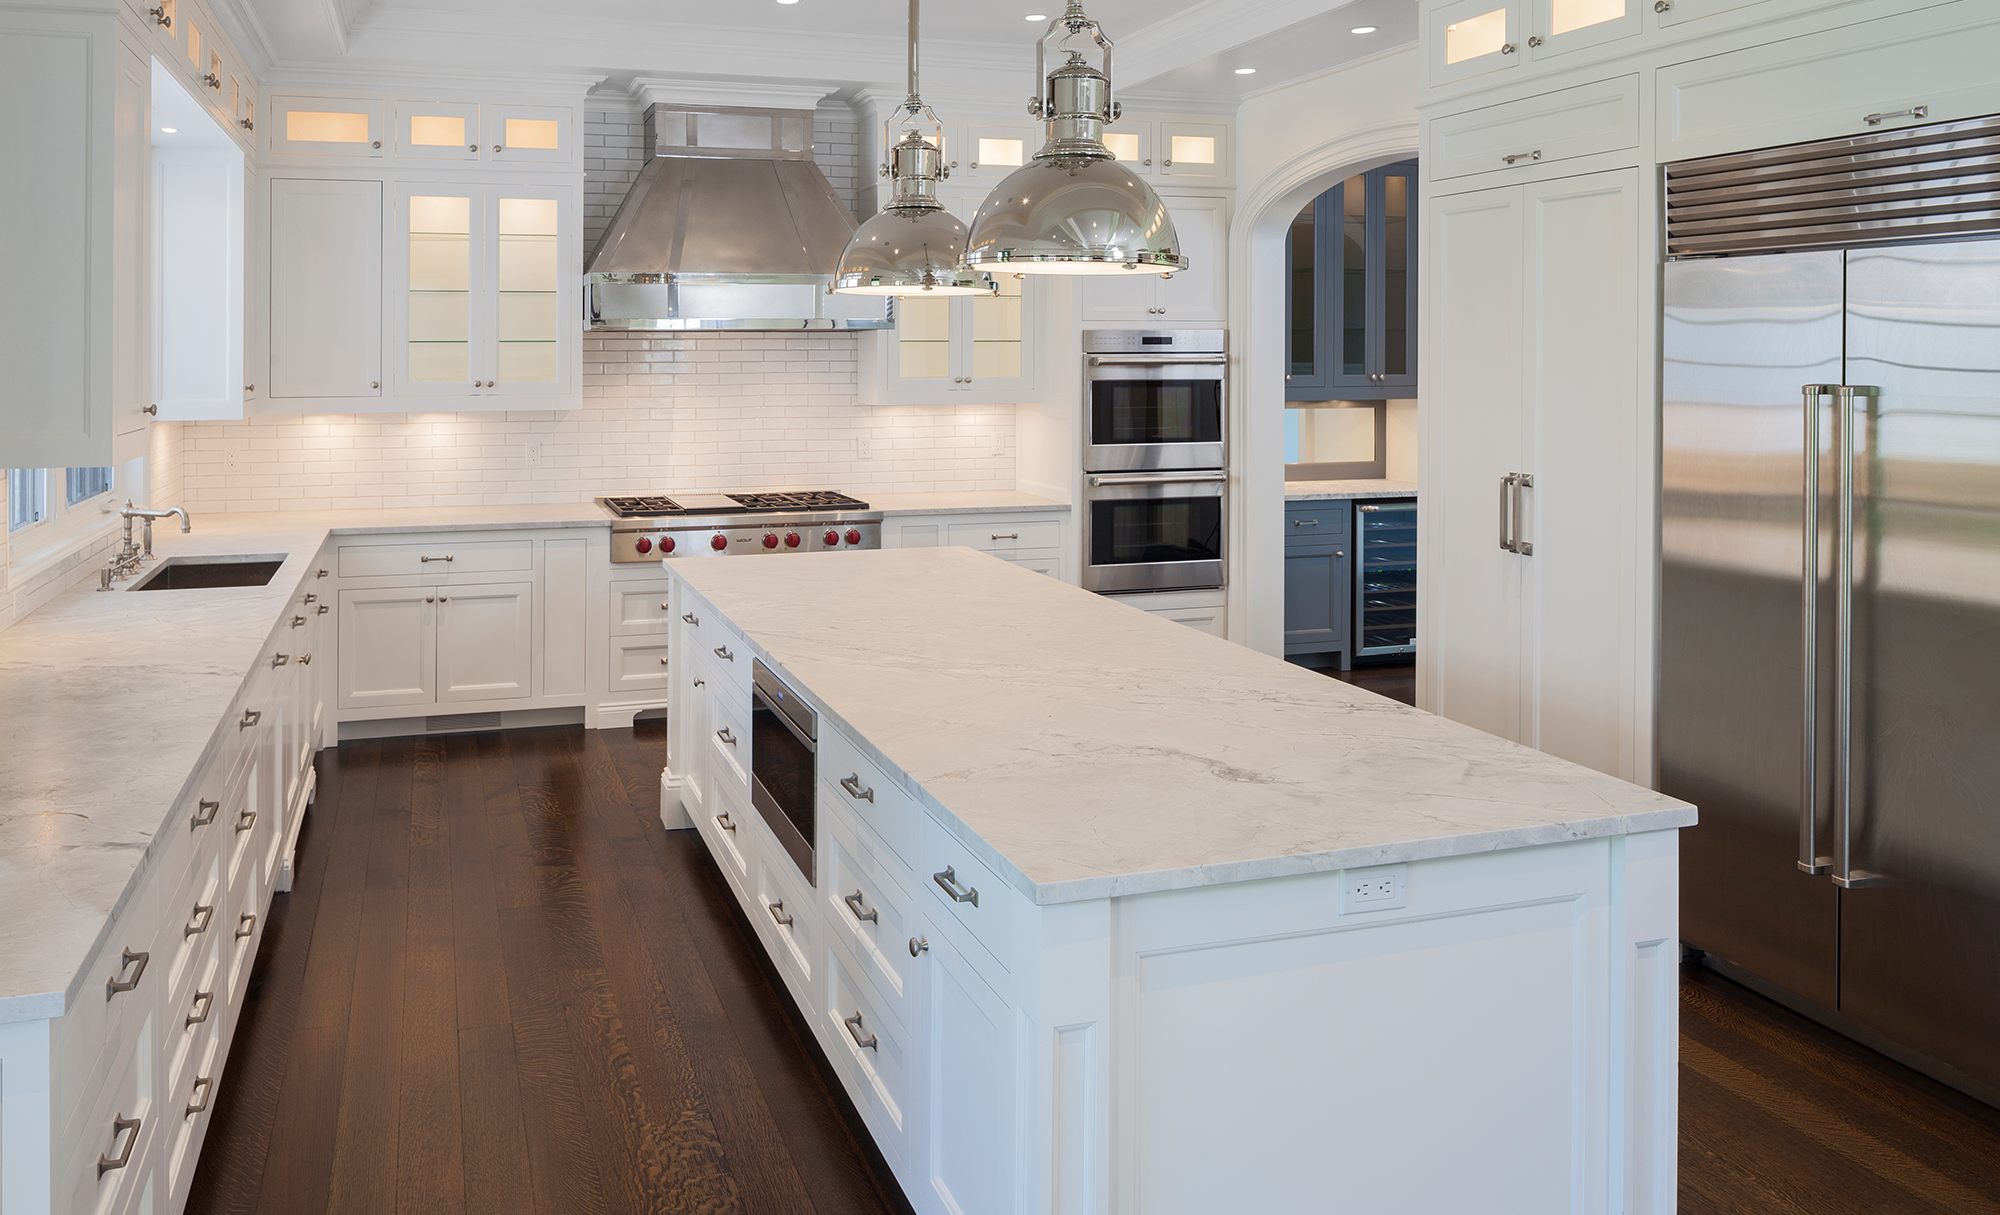 Large White Marble Kitchen Island